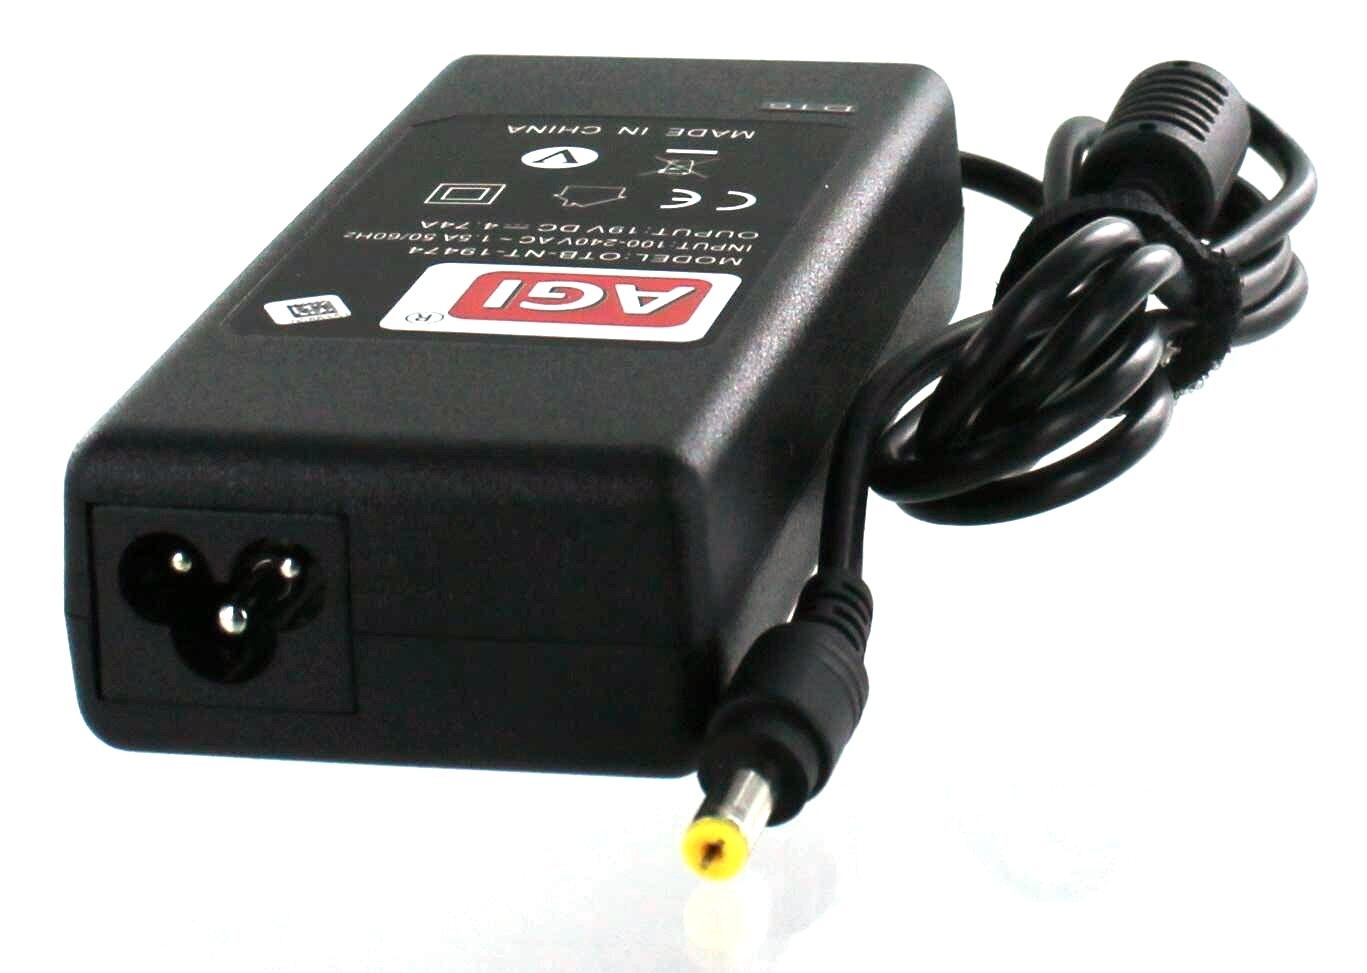 I Netzteil kompatibel mit PACKARD BELL EASYNOTE LM85JN-013GE kompatiblen